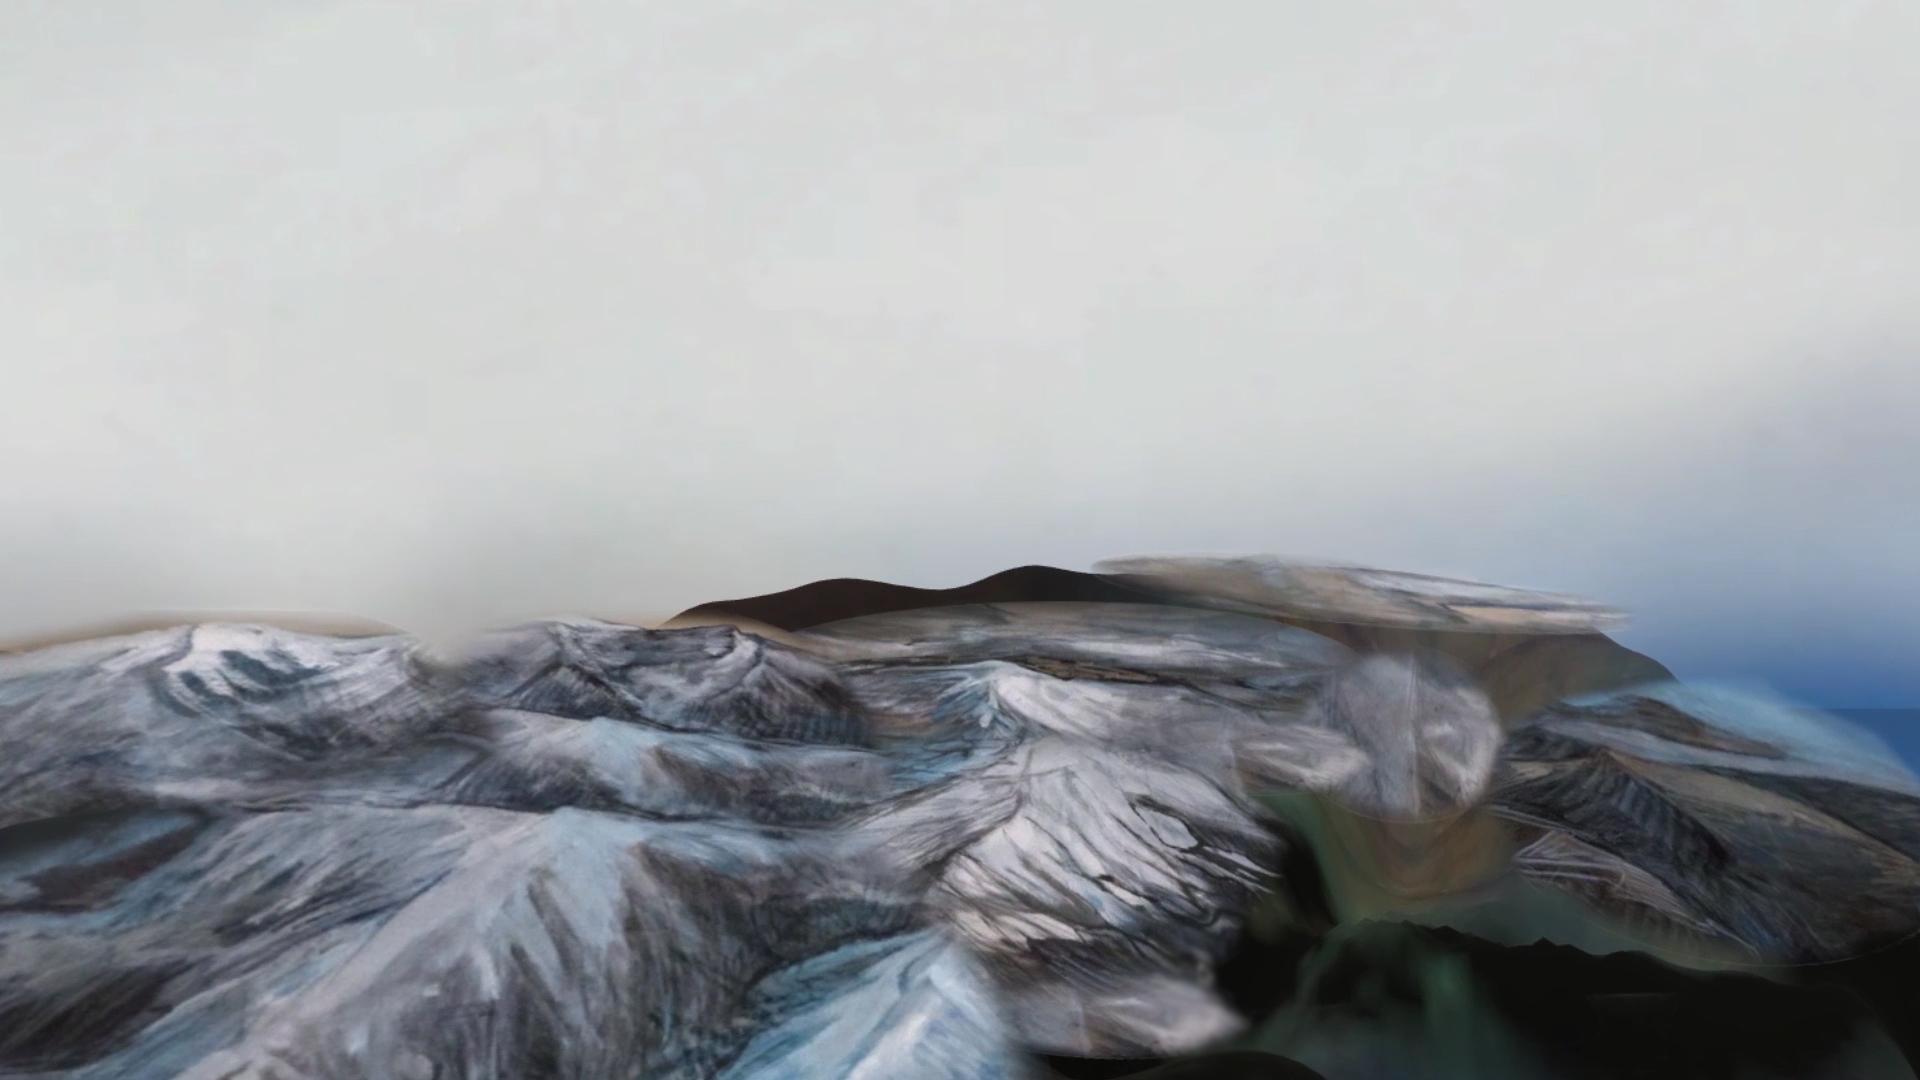 planescapes-nefeli-dimitriadi-leana-tounta